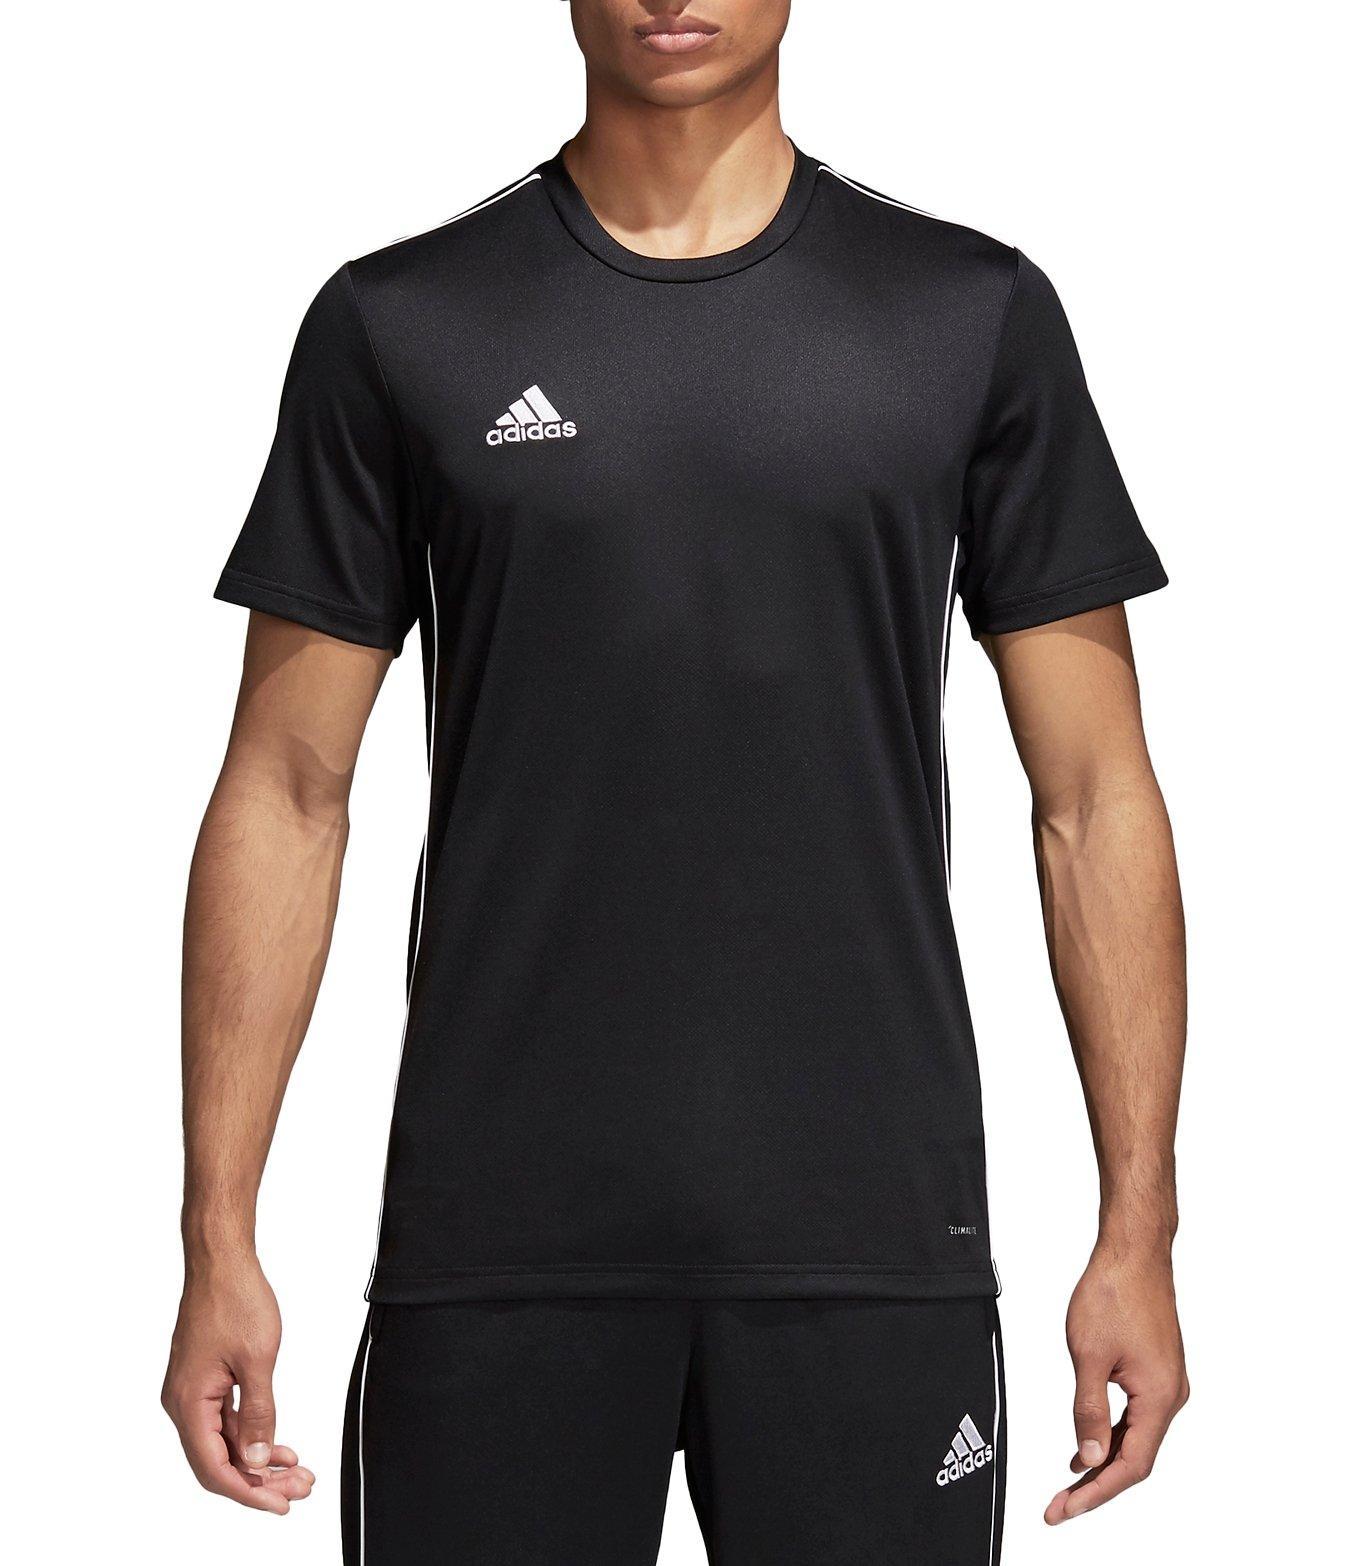 adidas core 18 training jersey online